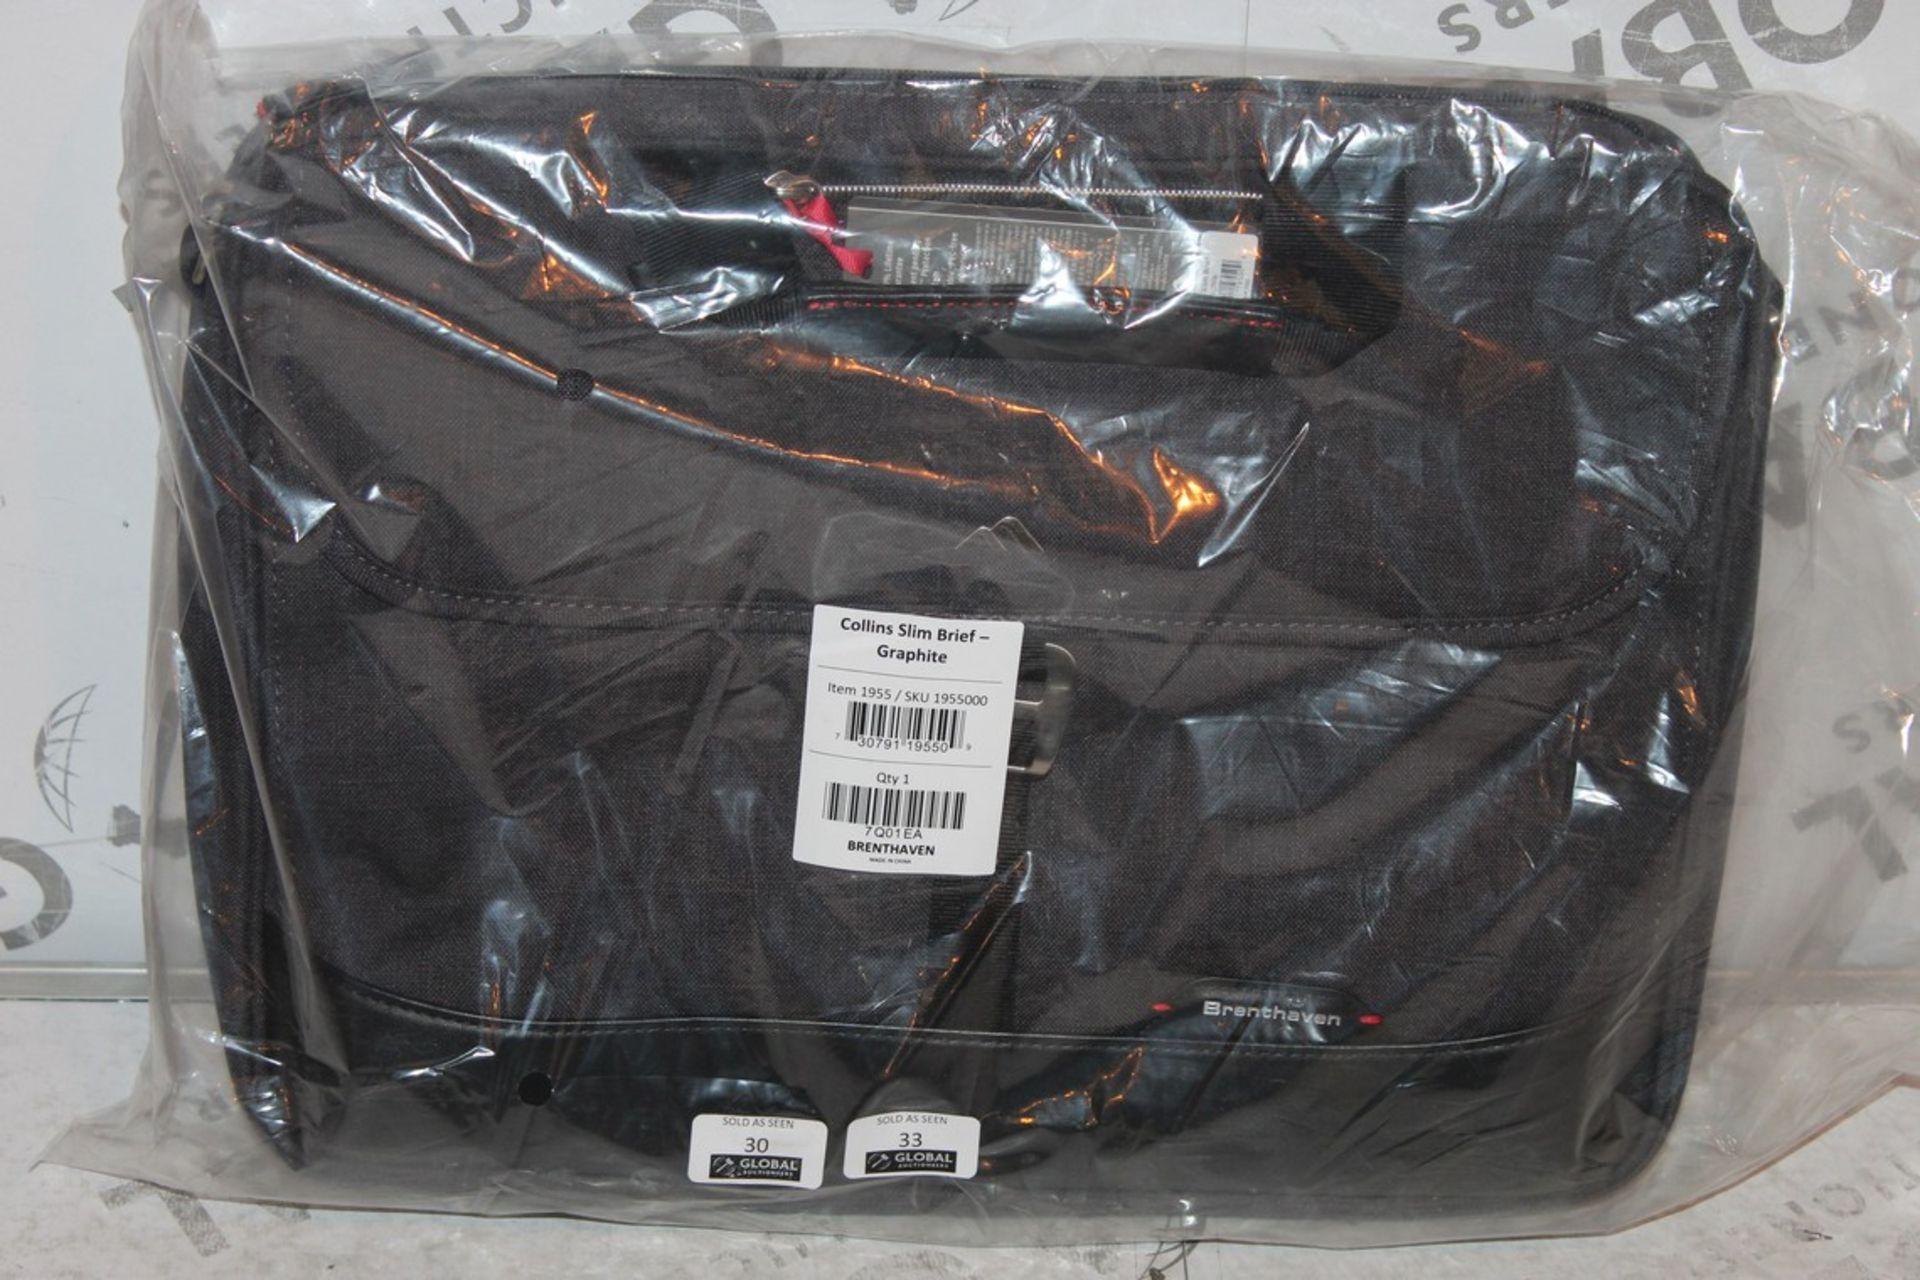 Lot 32 - Brand new Brenthaven Collins Slim, Graffiti Briefcase, RRP£55.00